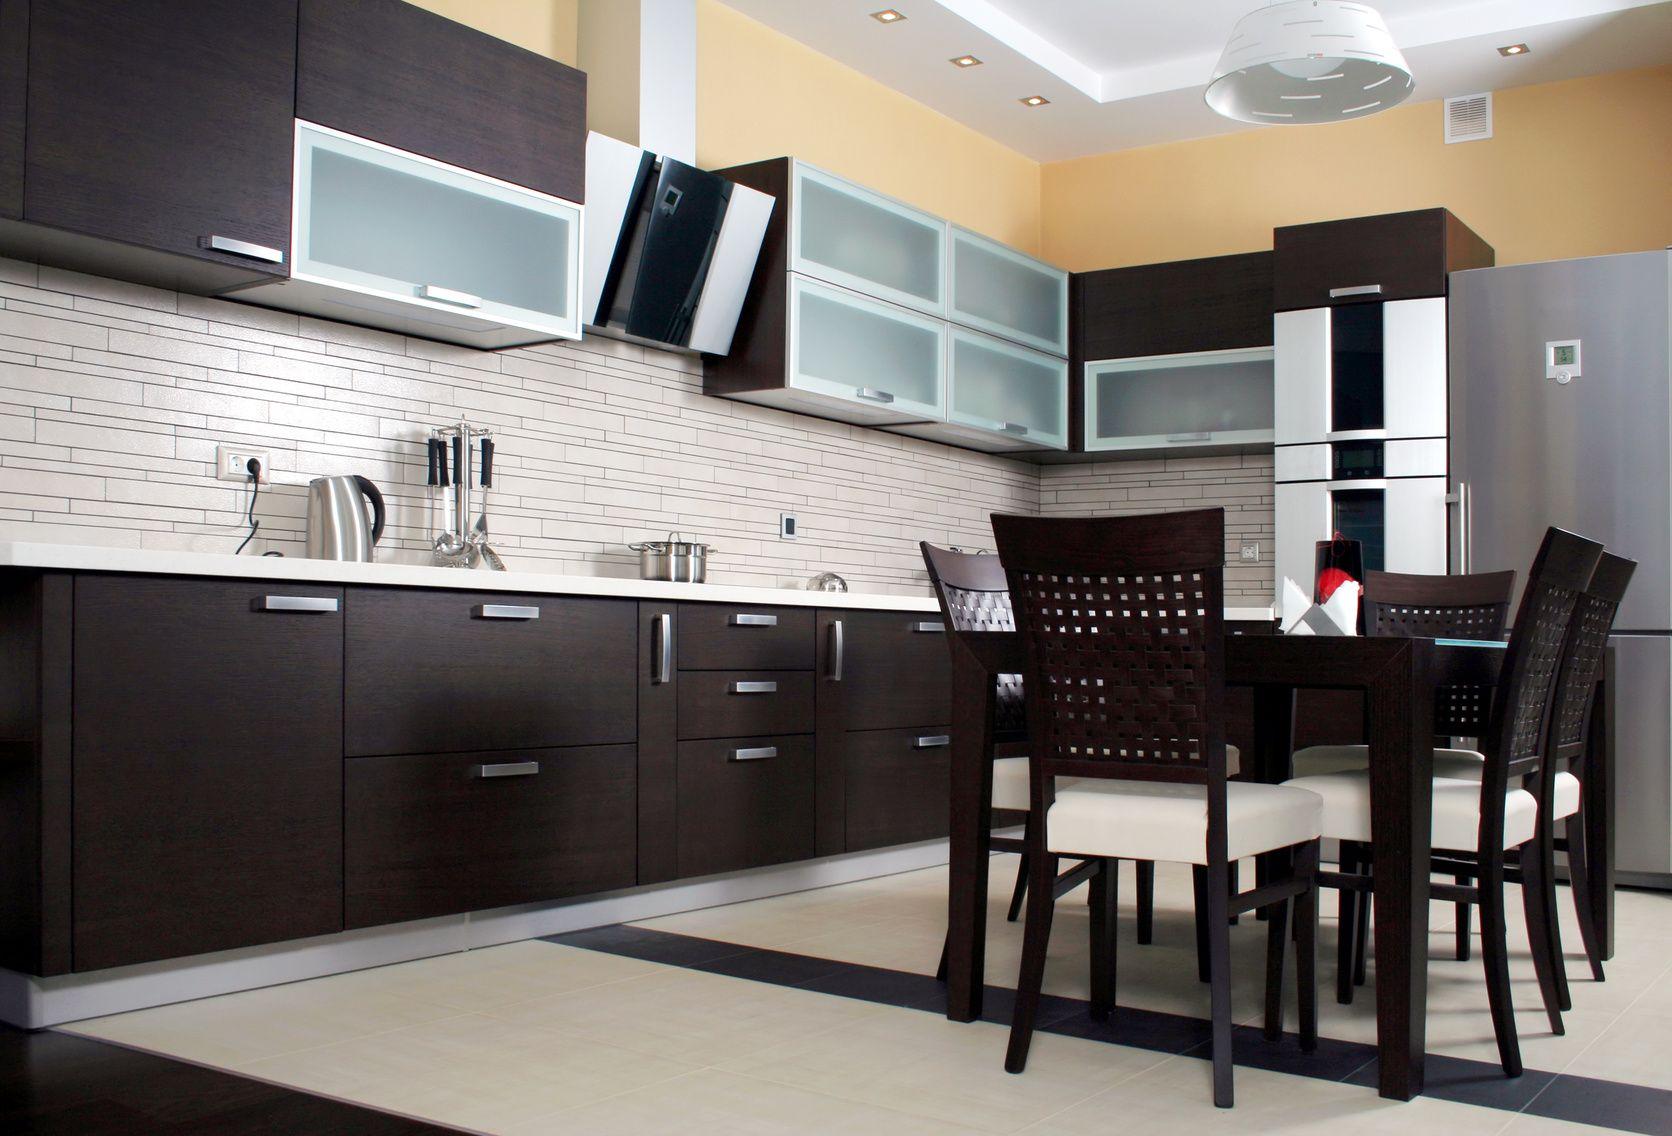 Wenge And Aluminum Glass Cabinet Doors Modern Kitchen Cabinet Design Contemporary Kitchen Cabinets Kitchen Cabinet Design